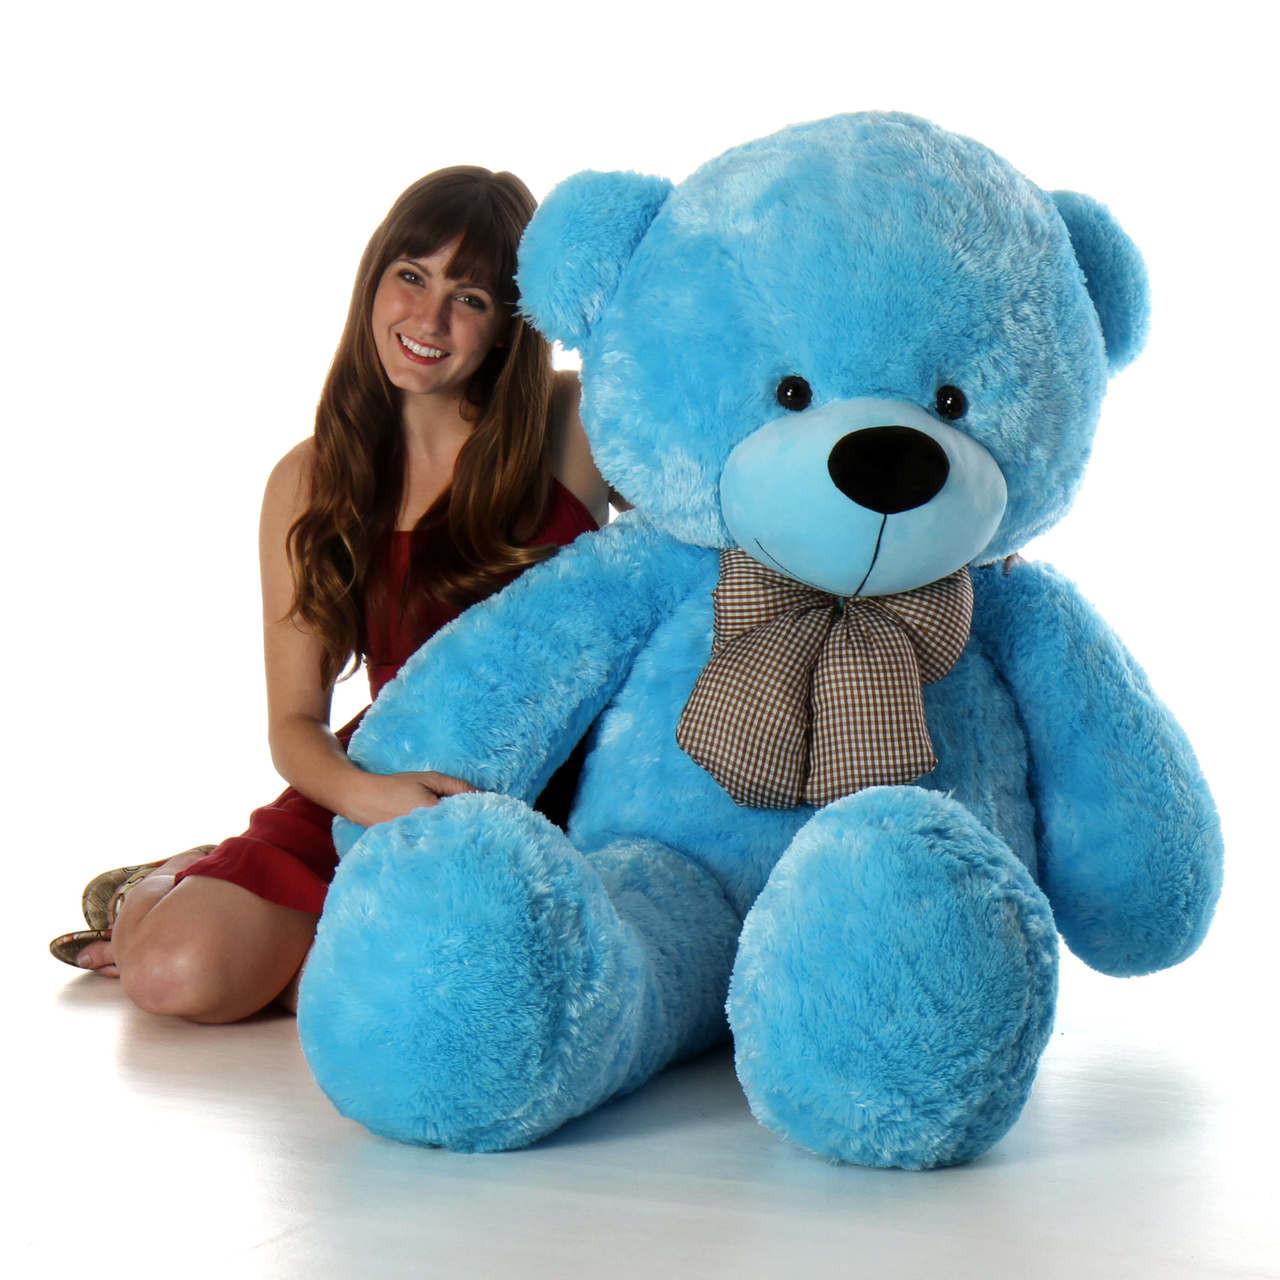 Happy cuddles 60in big blue plush teddy bear giant teddy bear happy cuddles big blue teddy bear 60in giant teddy bear altavistaventures Images